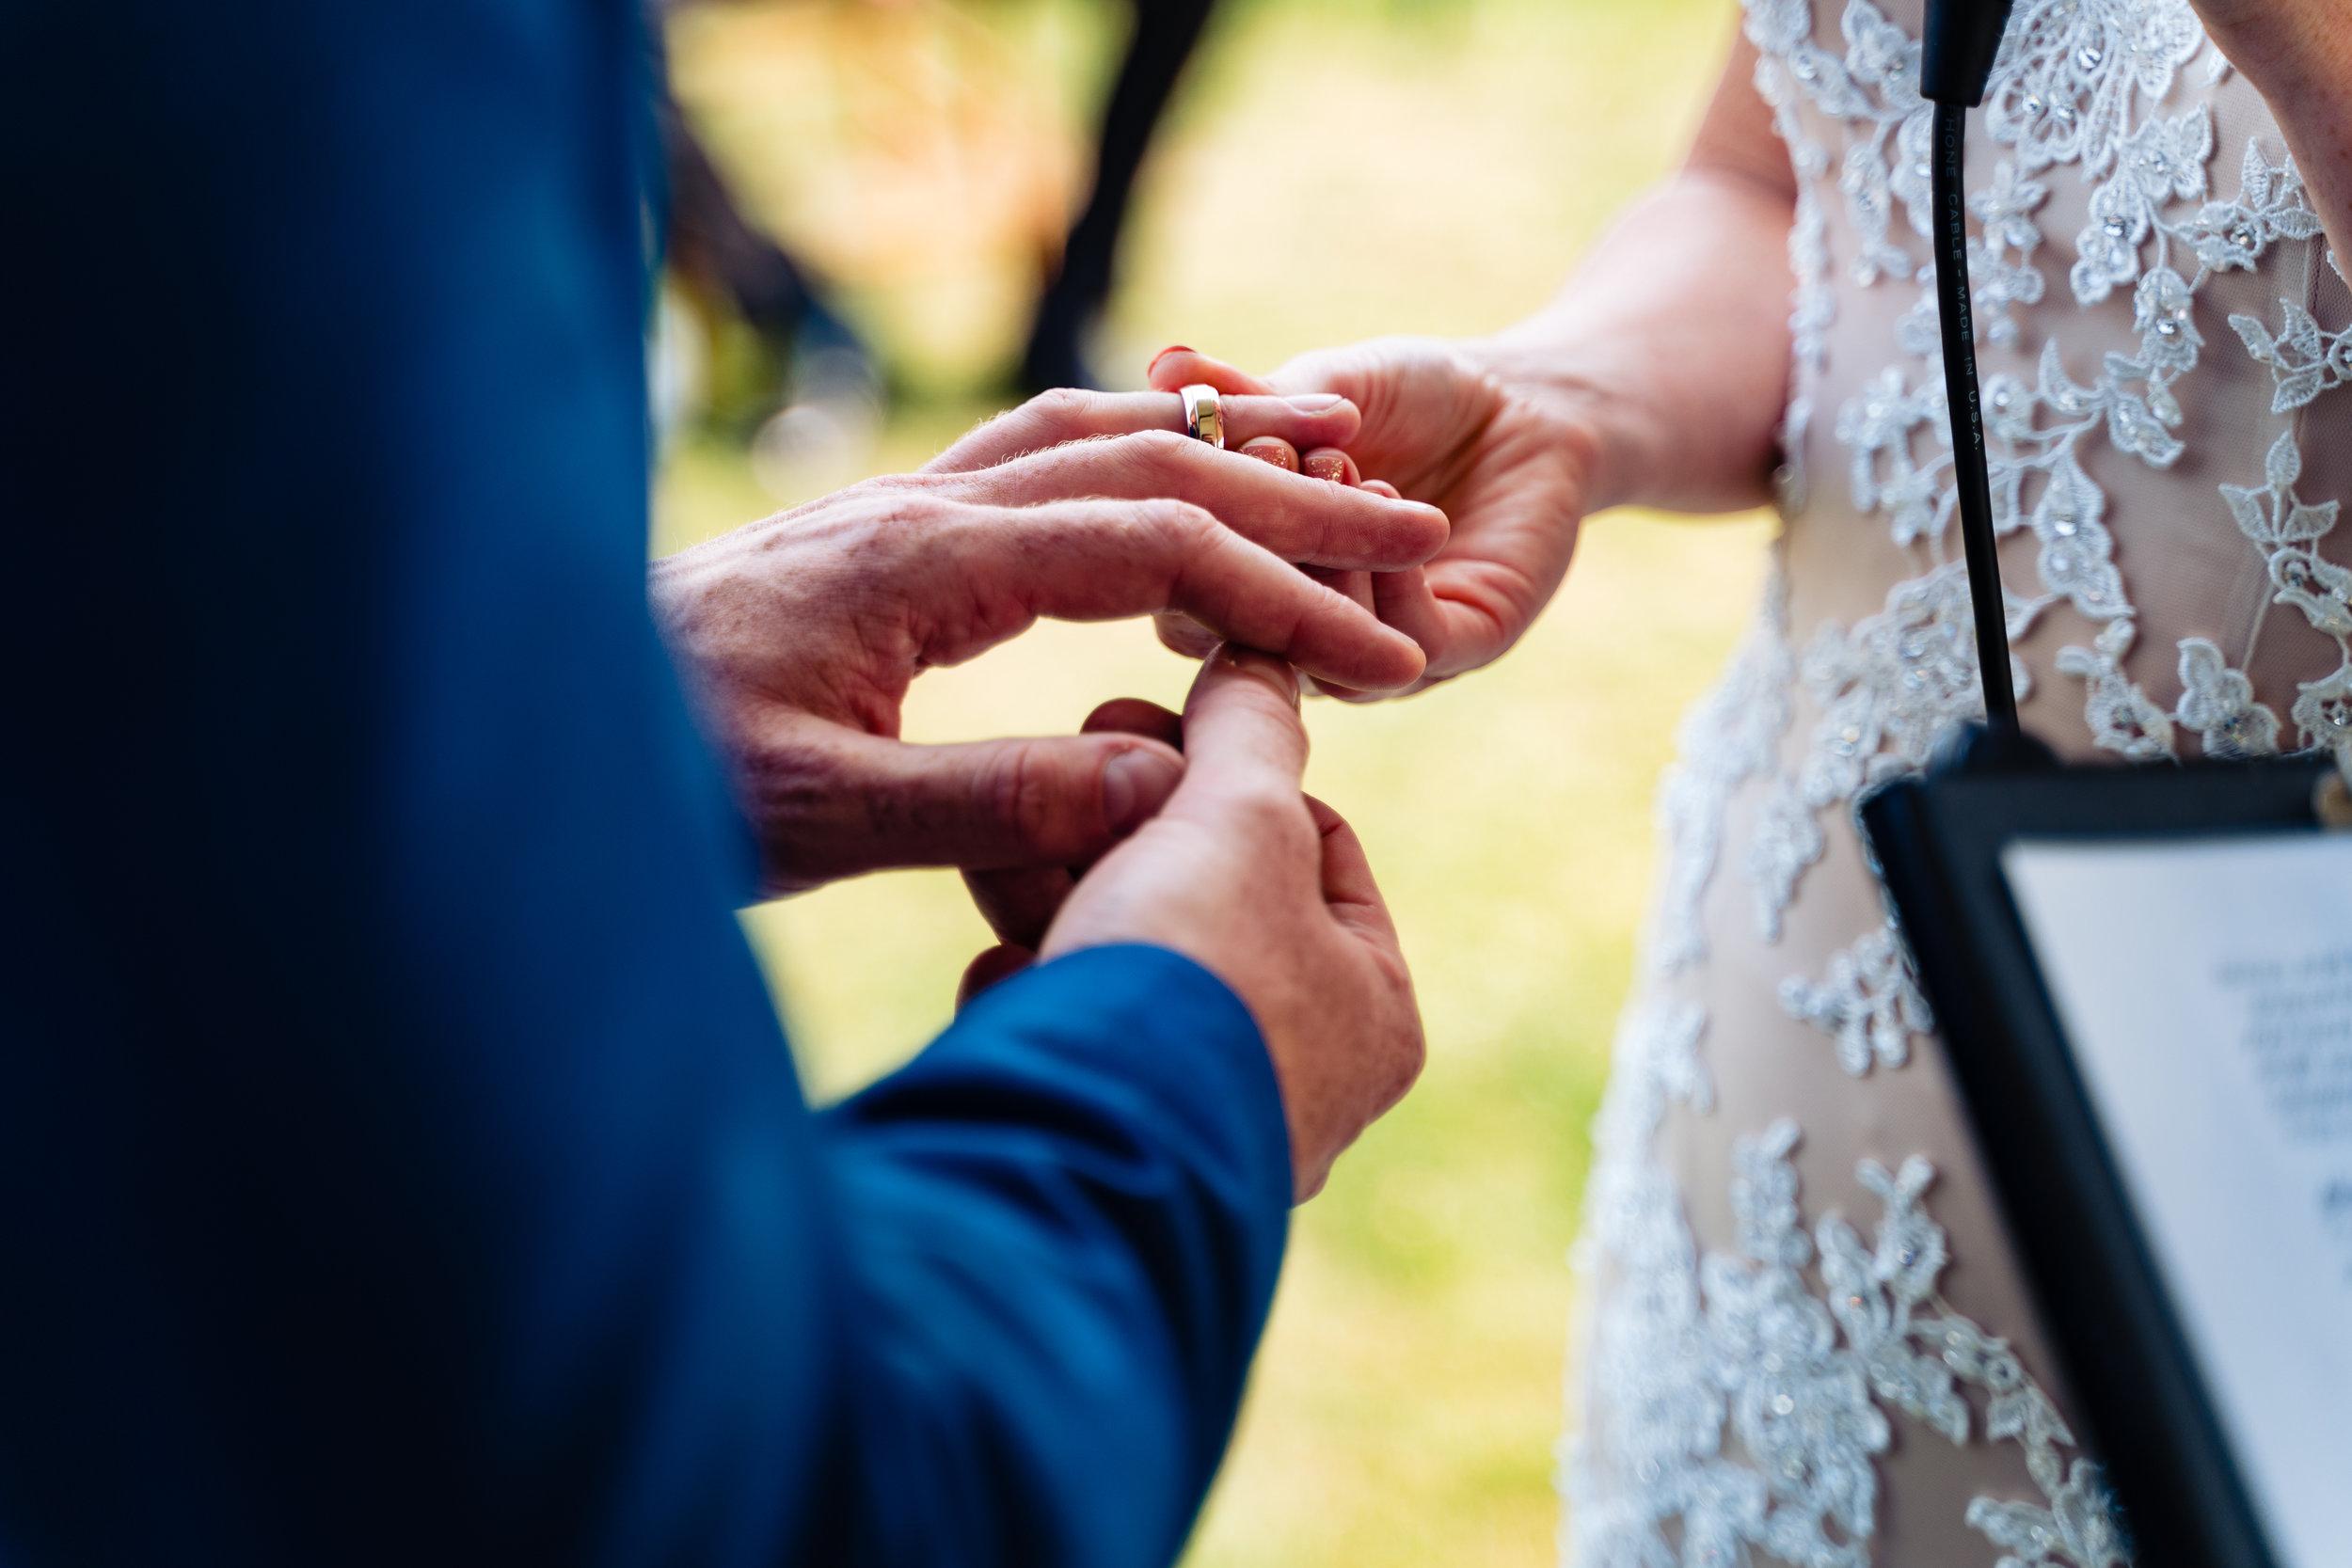 Jenna-Pat-267halifax-novascotia-weddingphotography-wedding-foxandfellow.jpg